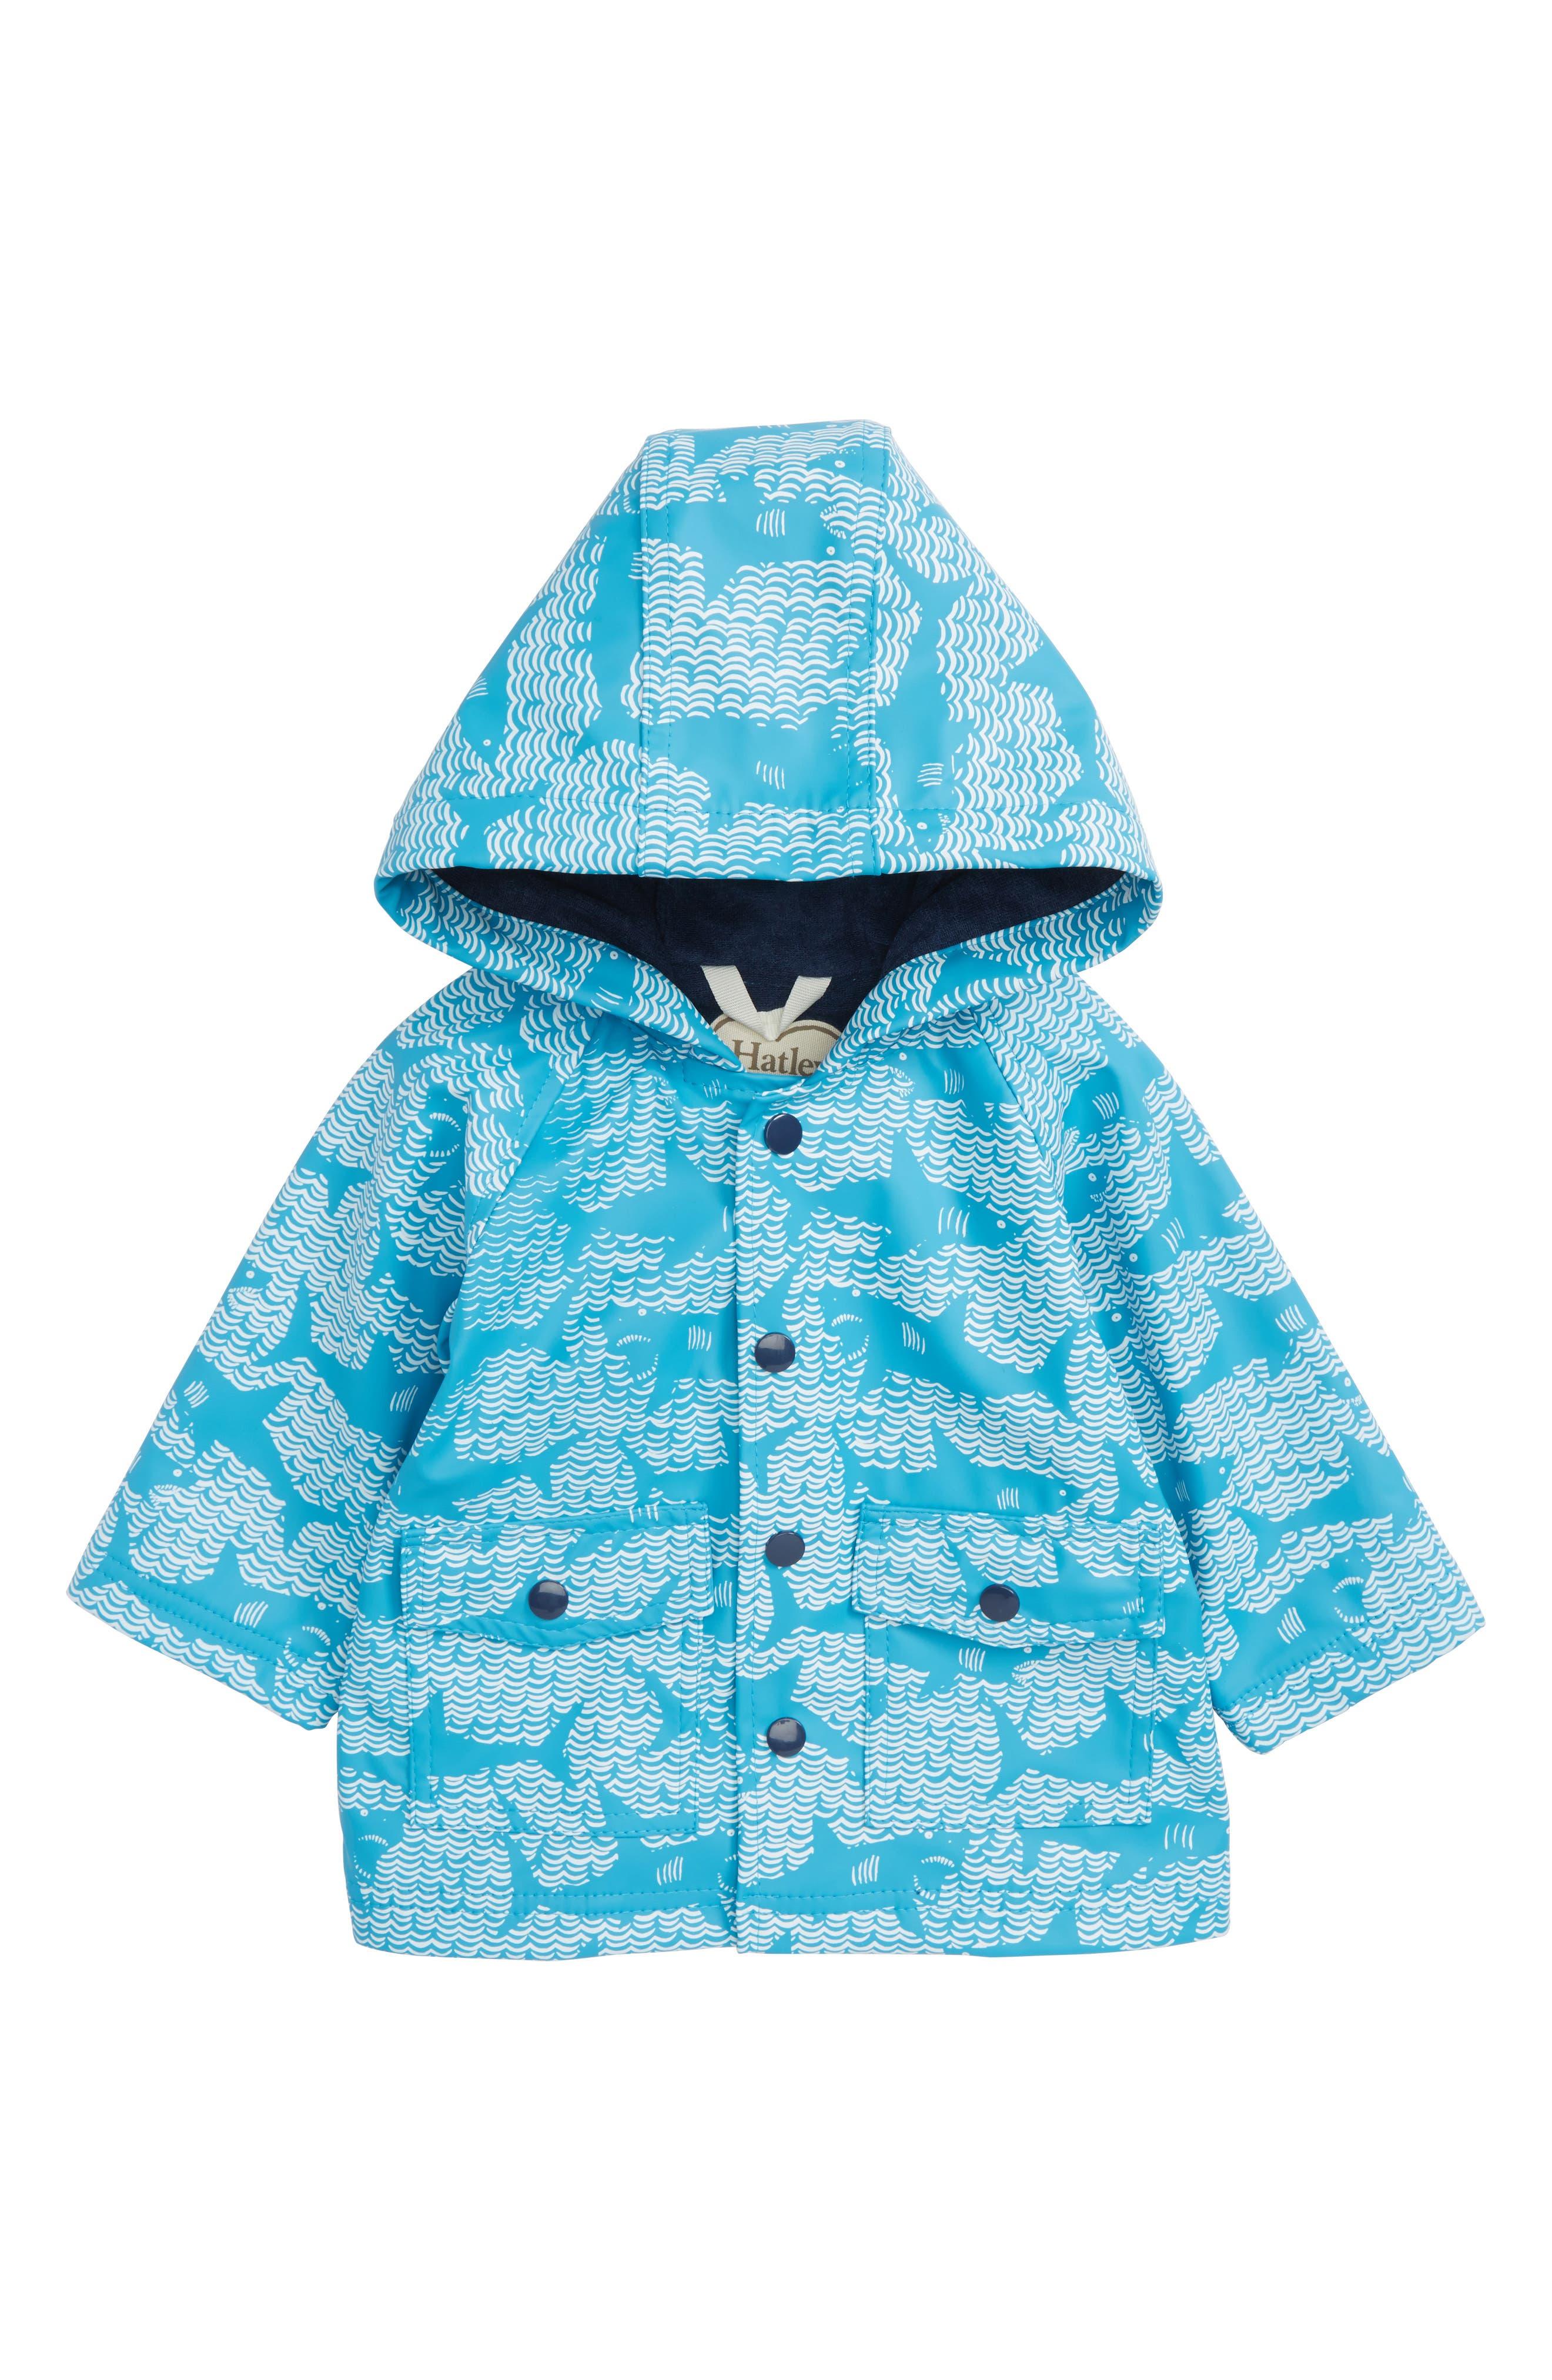 Shark Alley Hooded Raincoat,                             Main thumbnail 1, color,                             Shark Alley